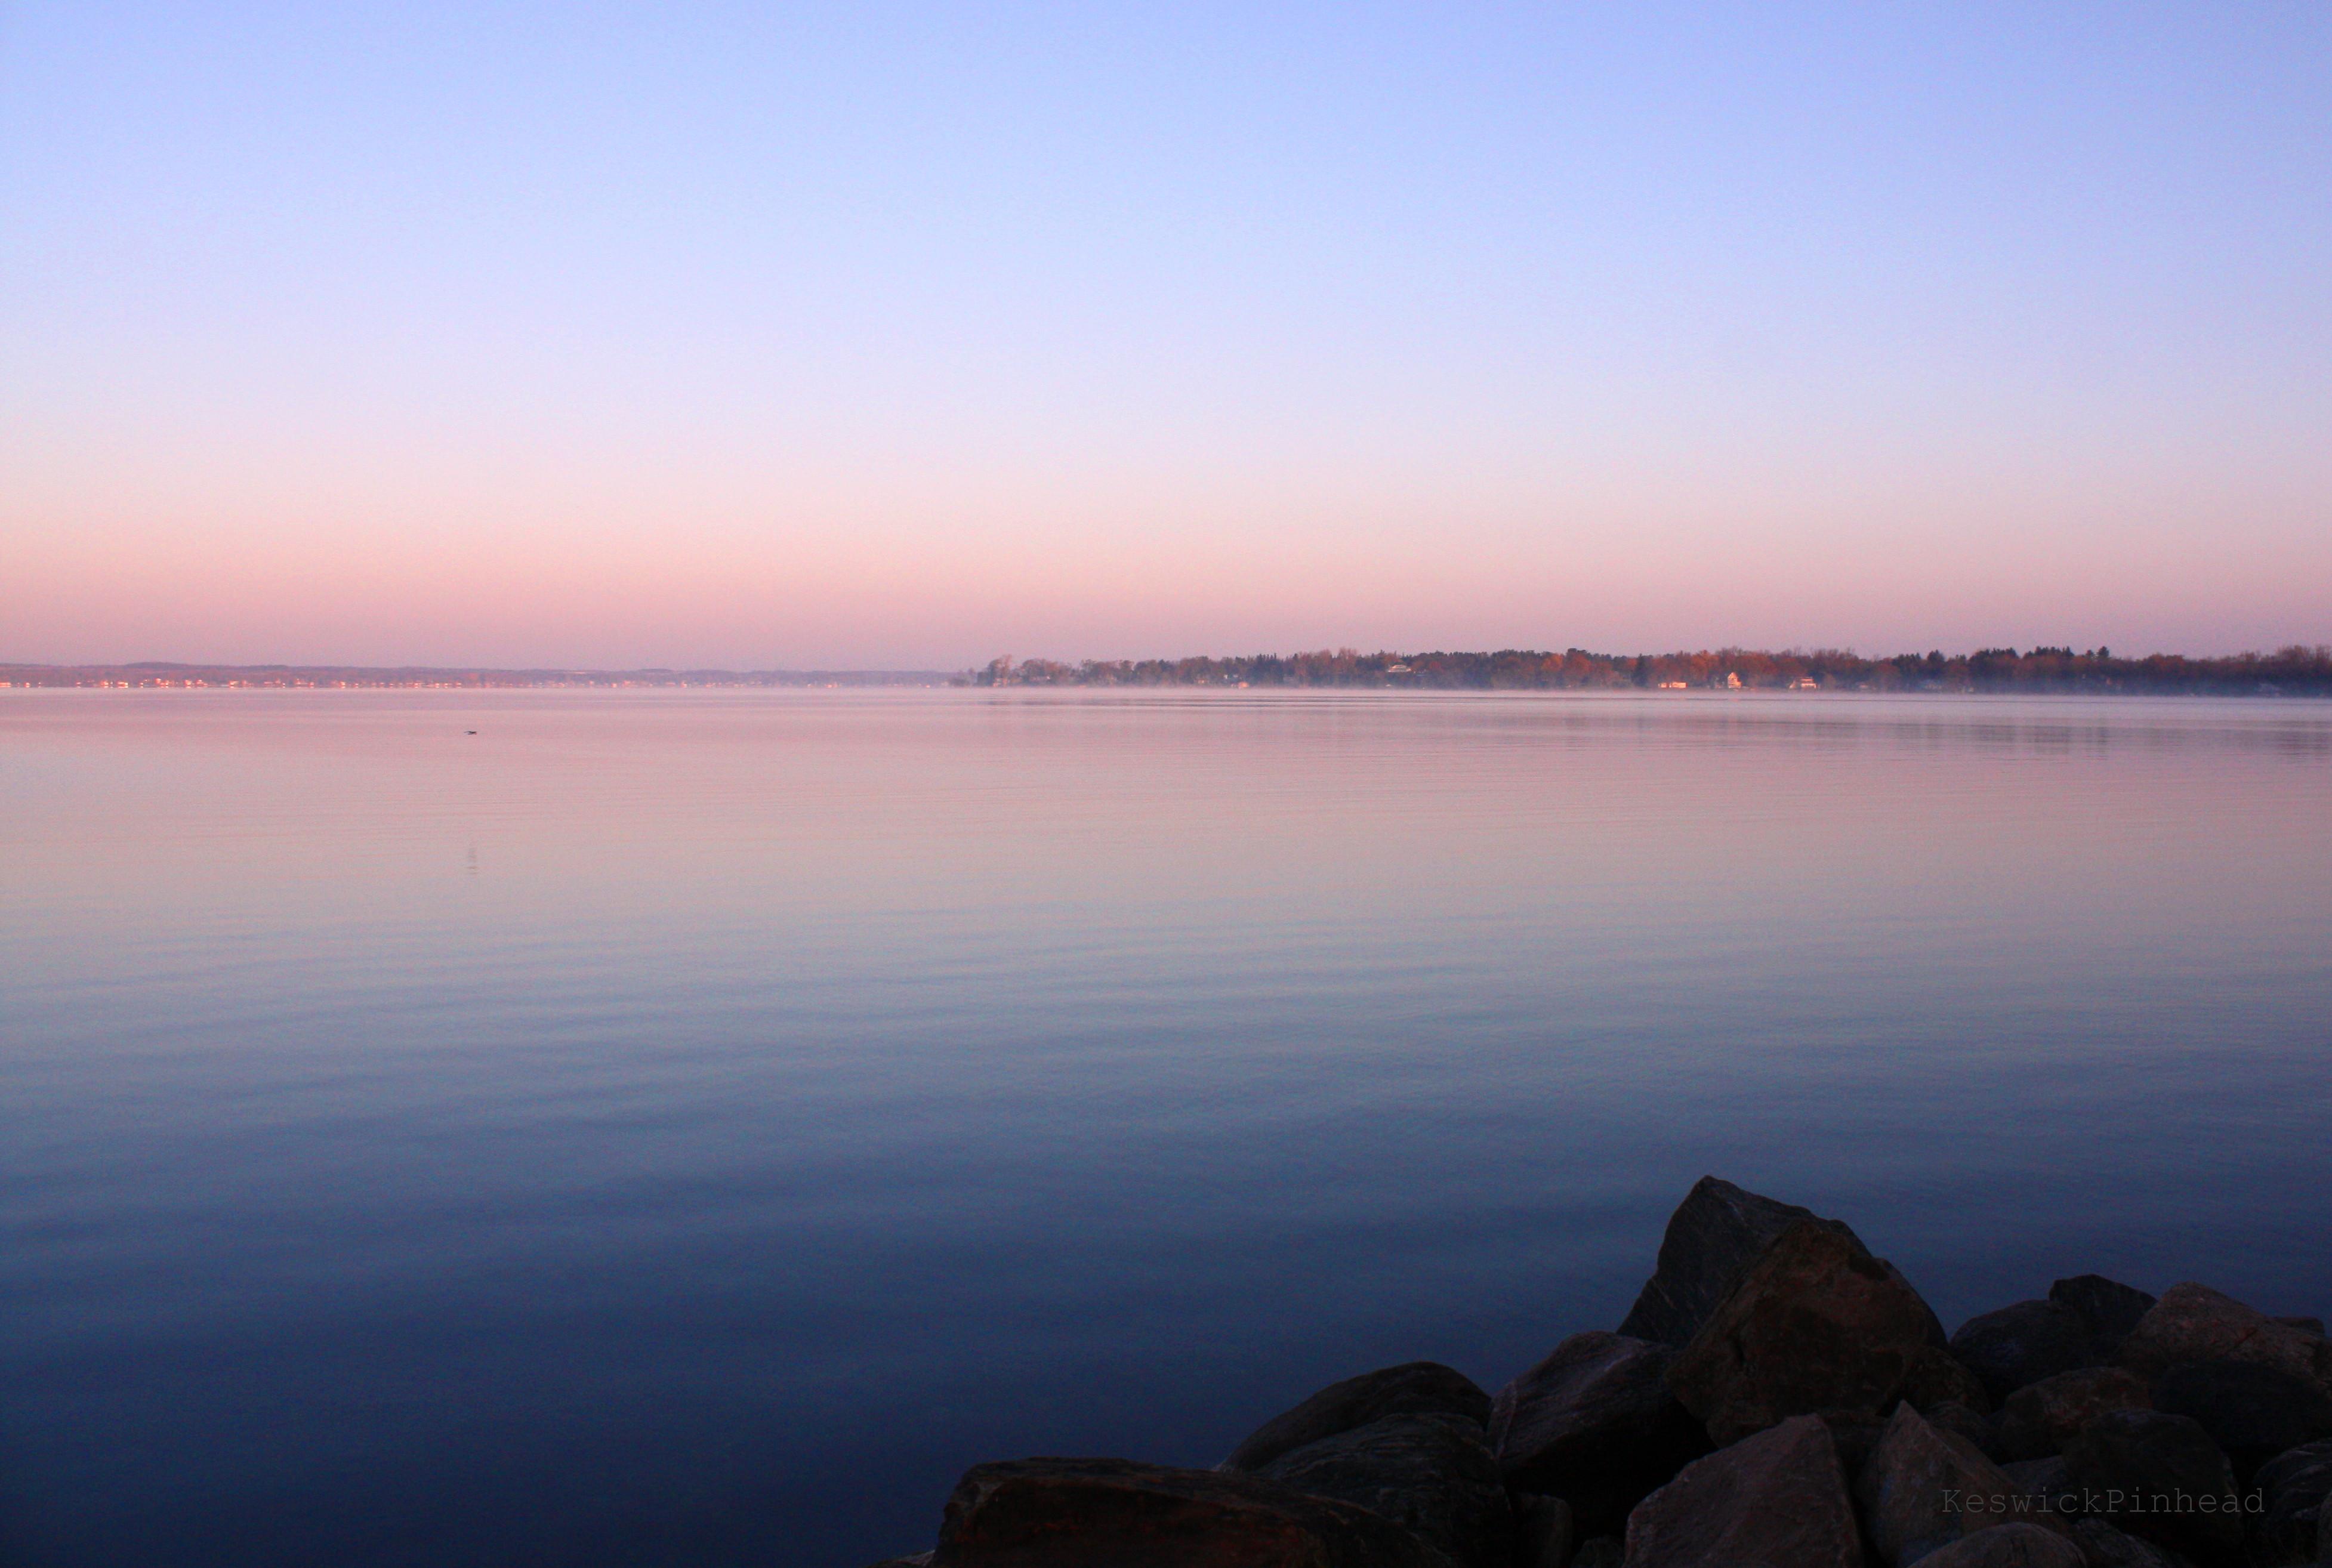 Lake Simcoe - Wikipedia